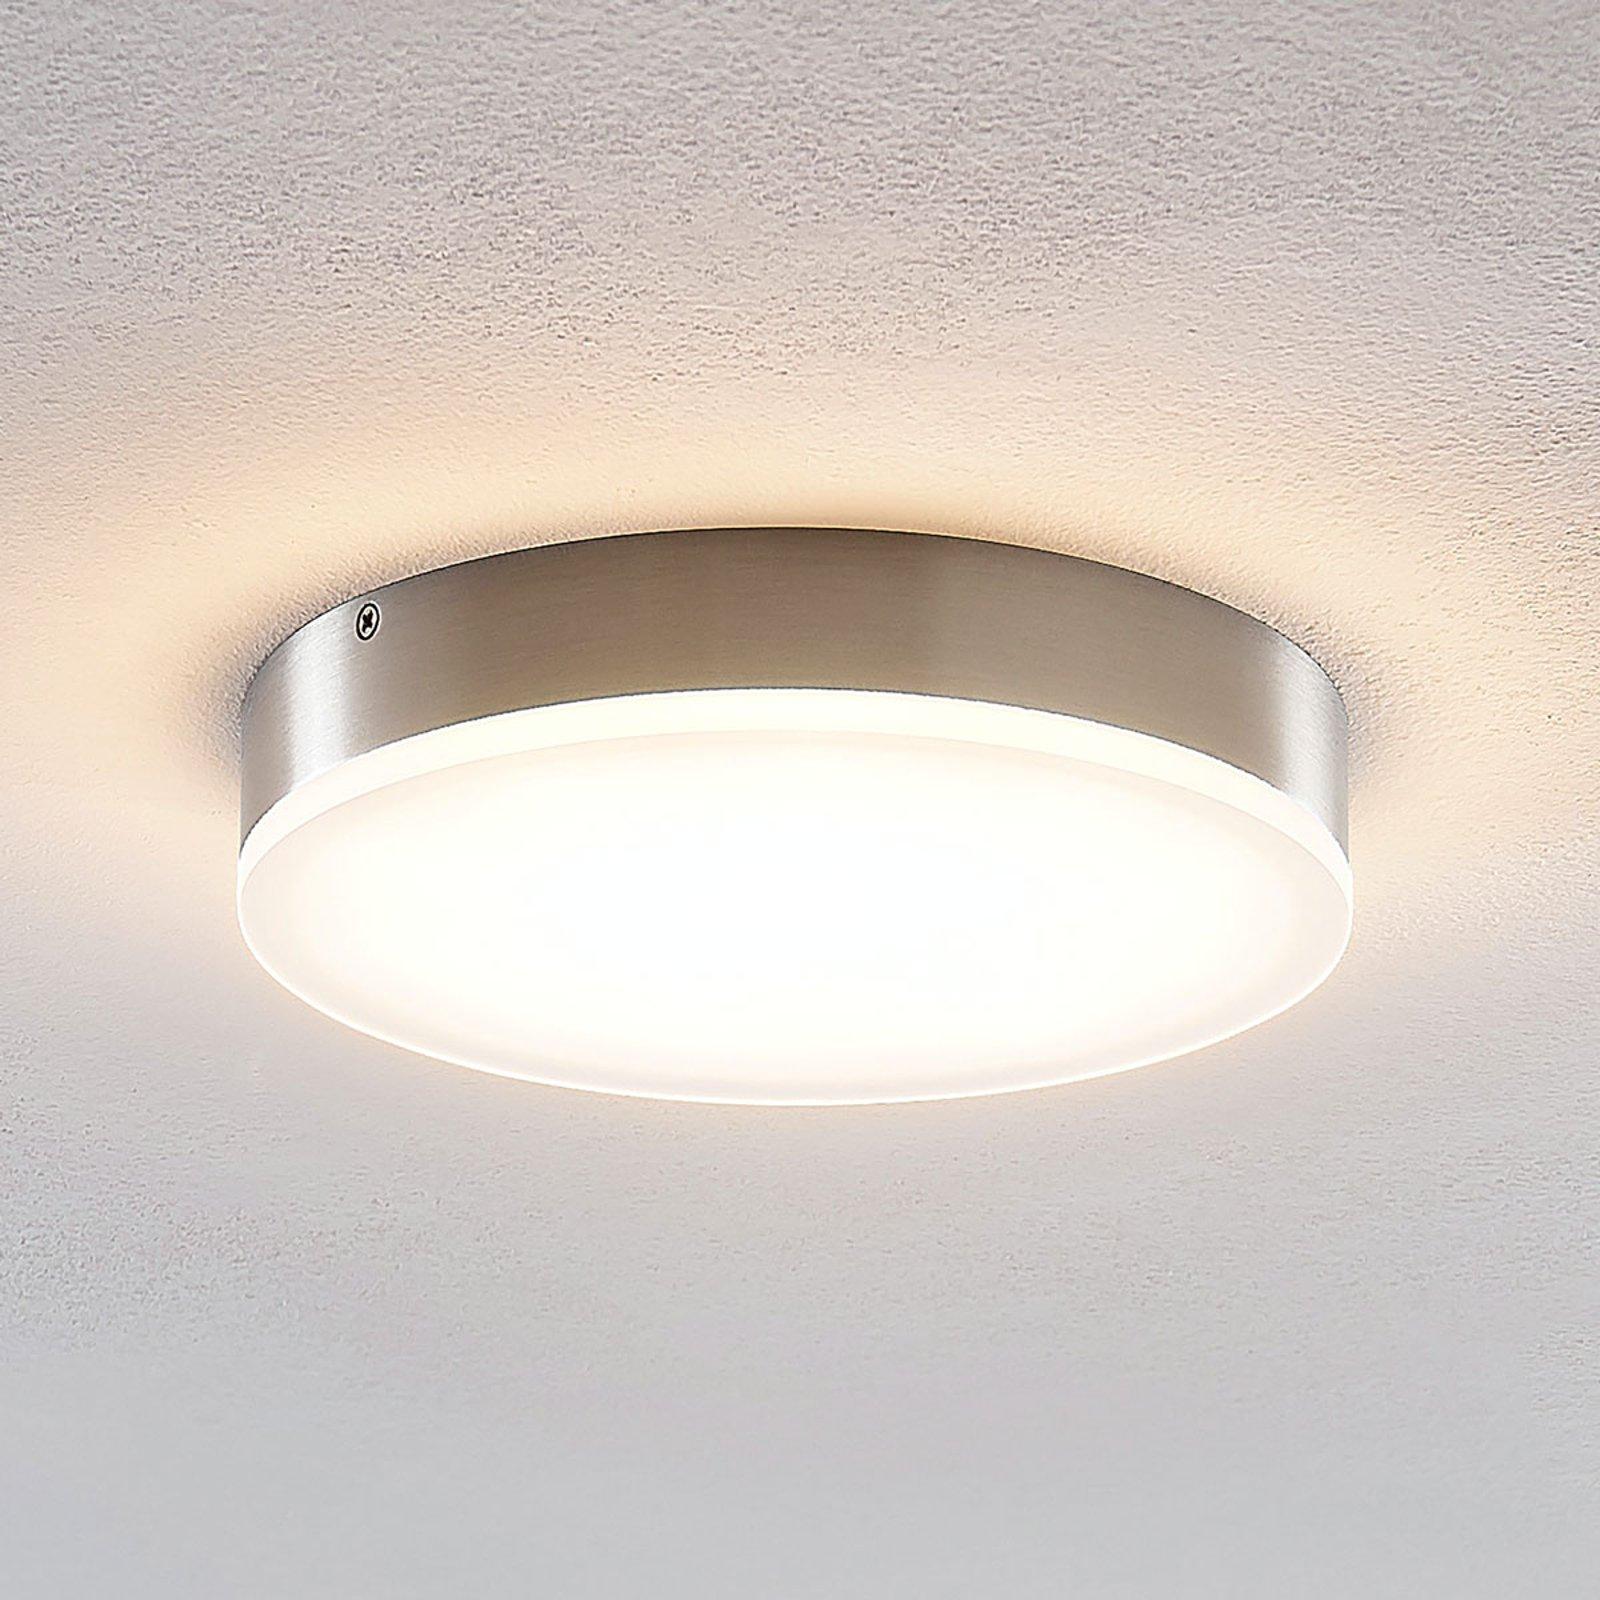 Lindby Leonta LED-taklampe, nikkel, Ø 20 cm